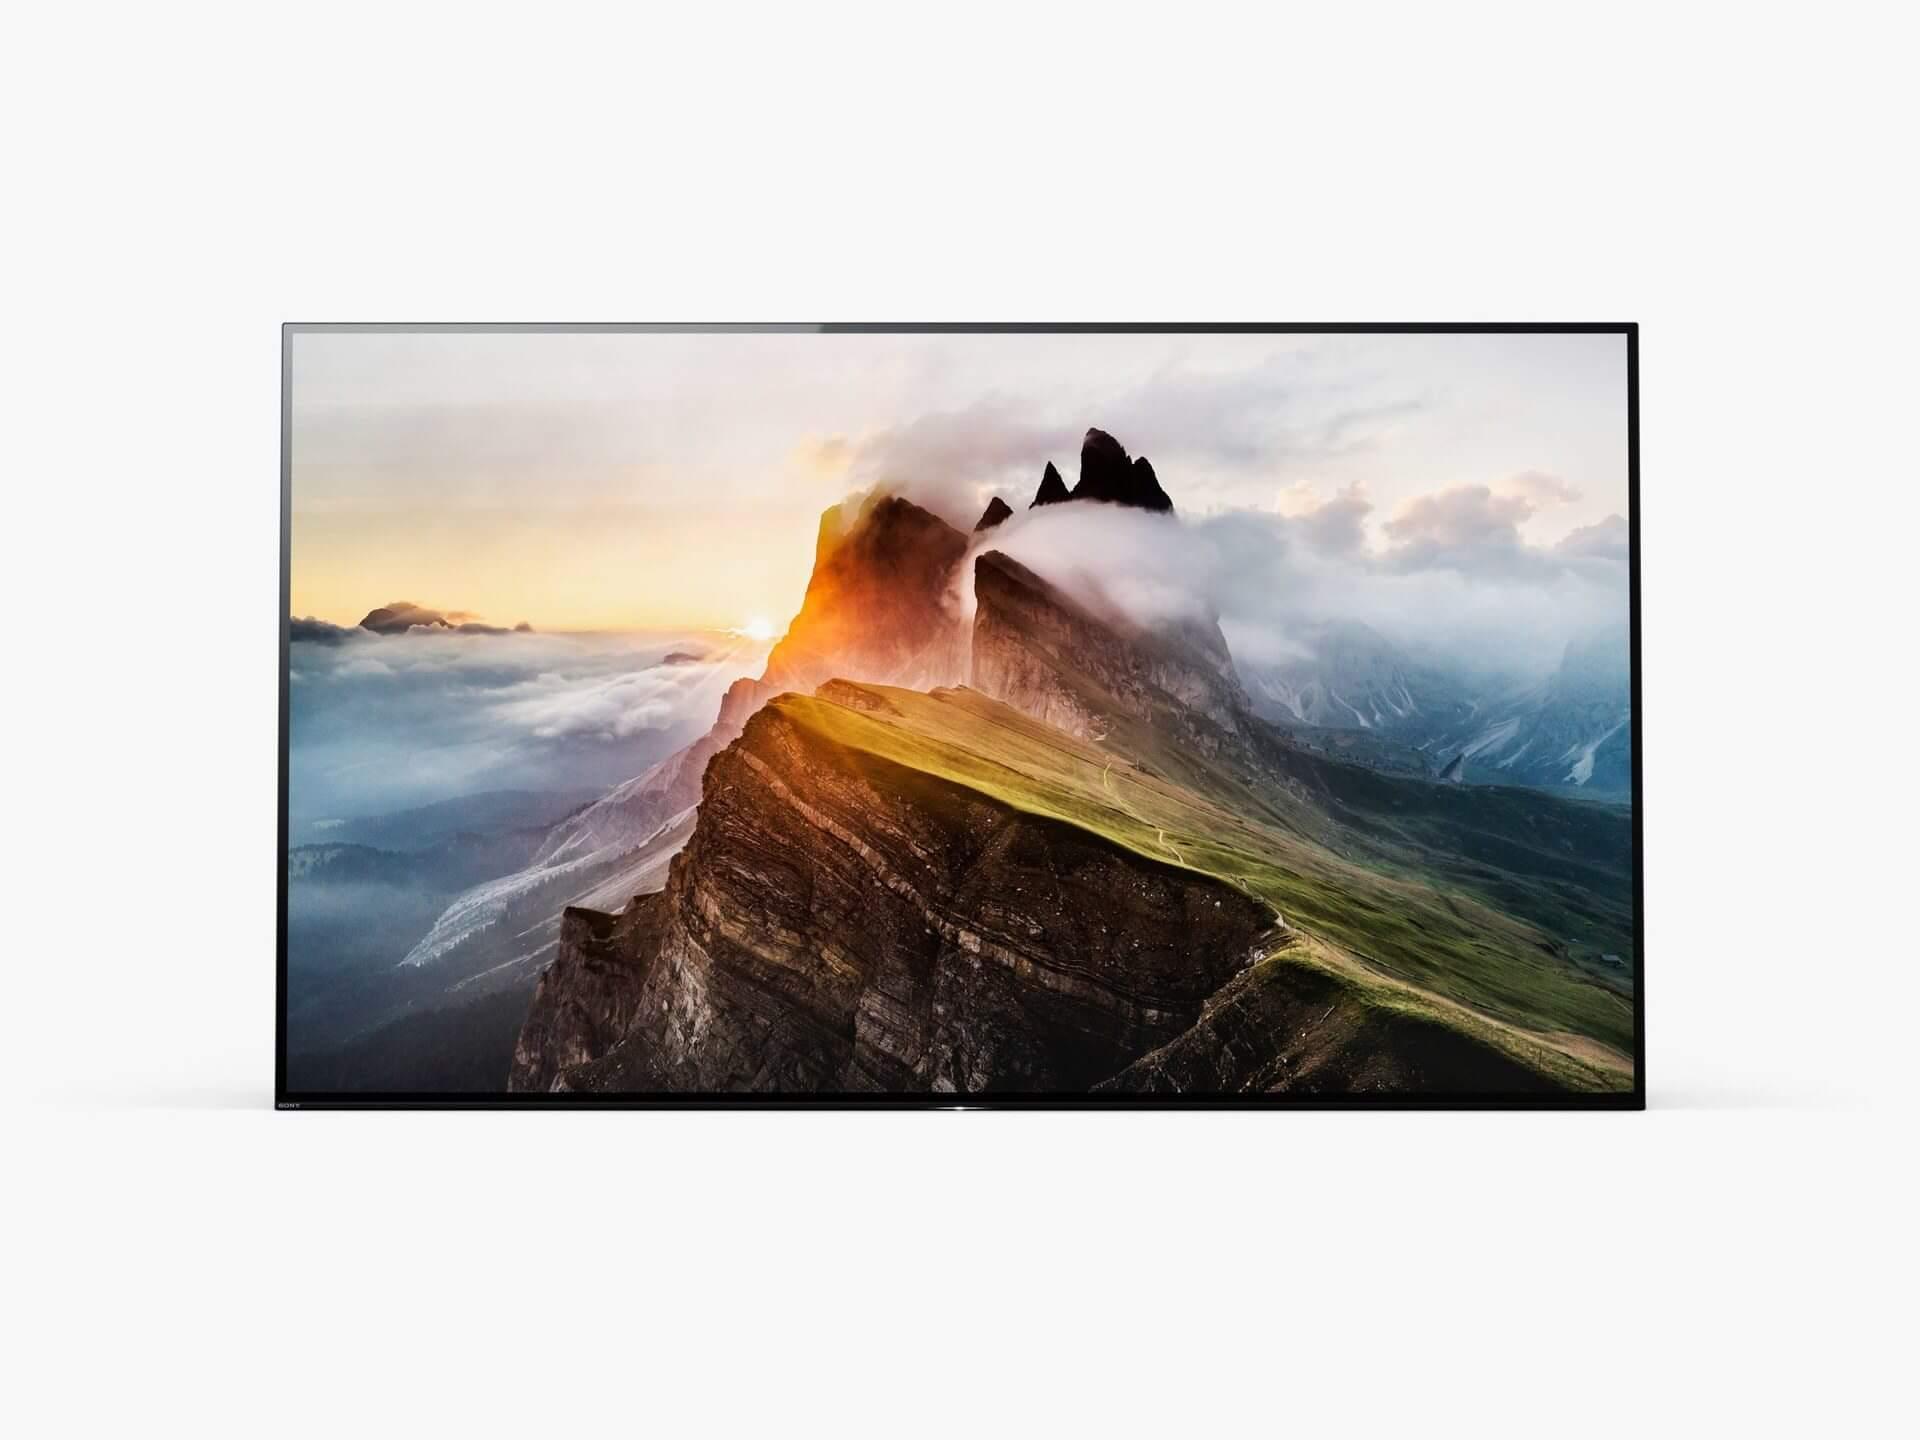 TV2 - CES 2017: Sony lança primeira tela OLED e projetor 4K